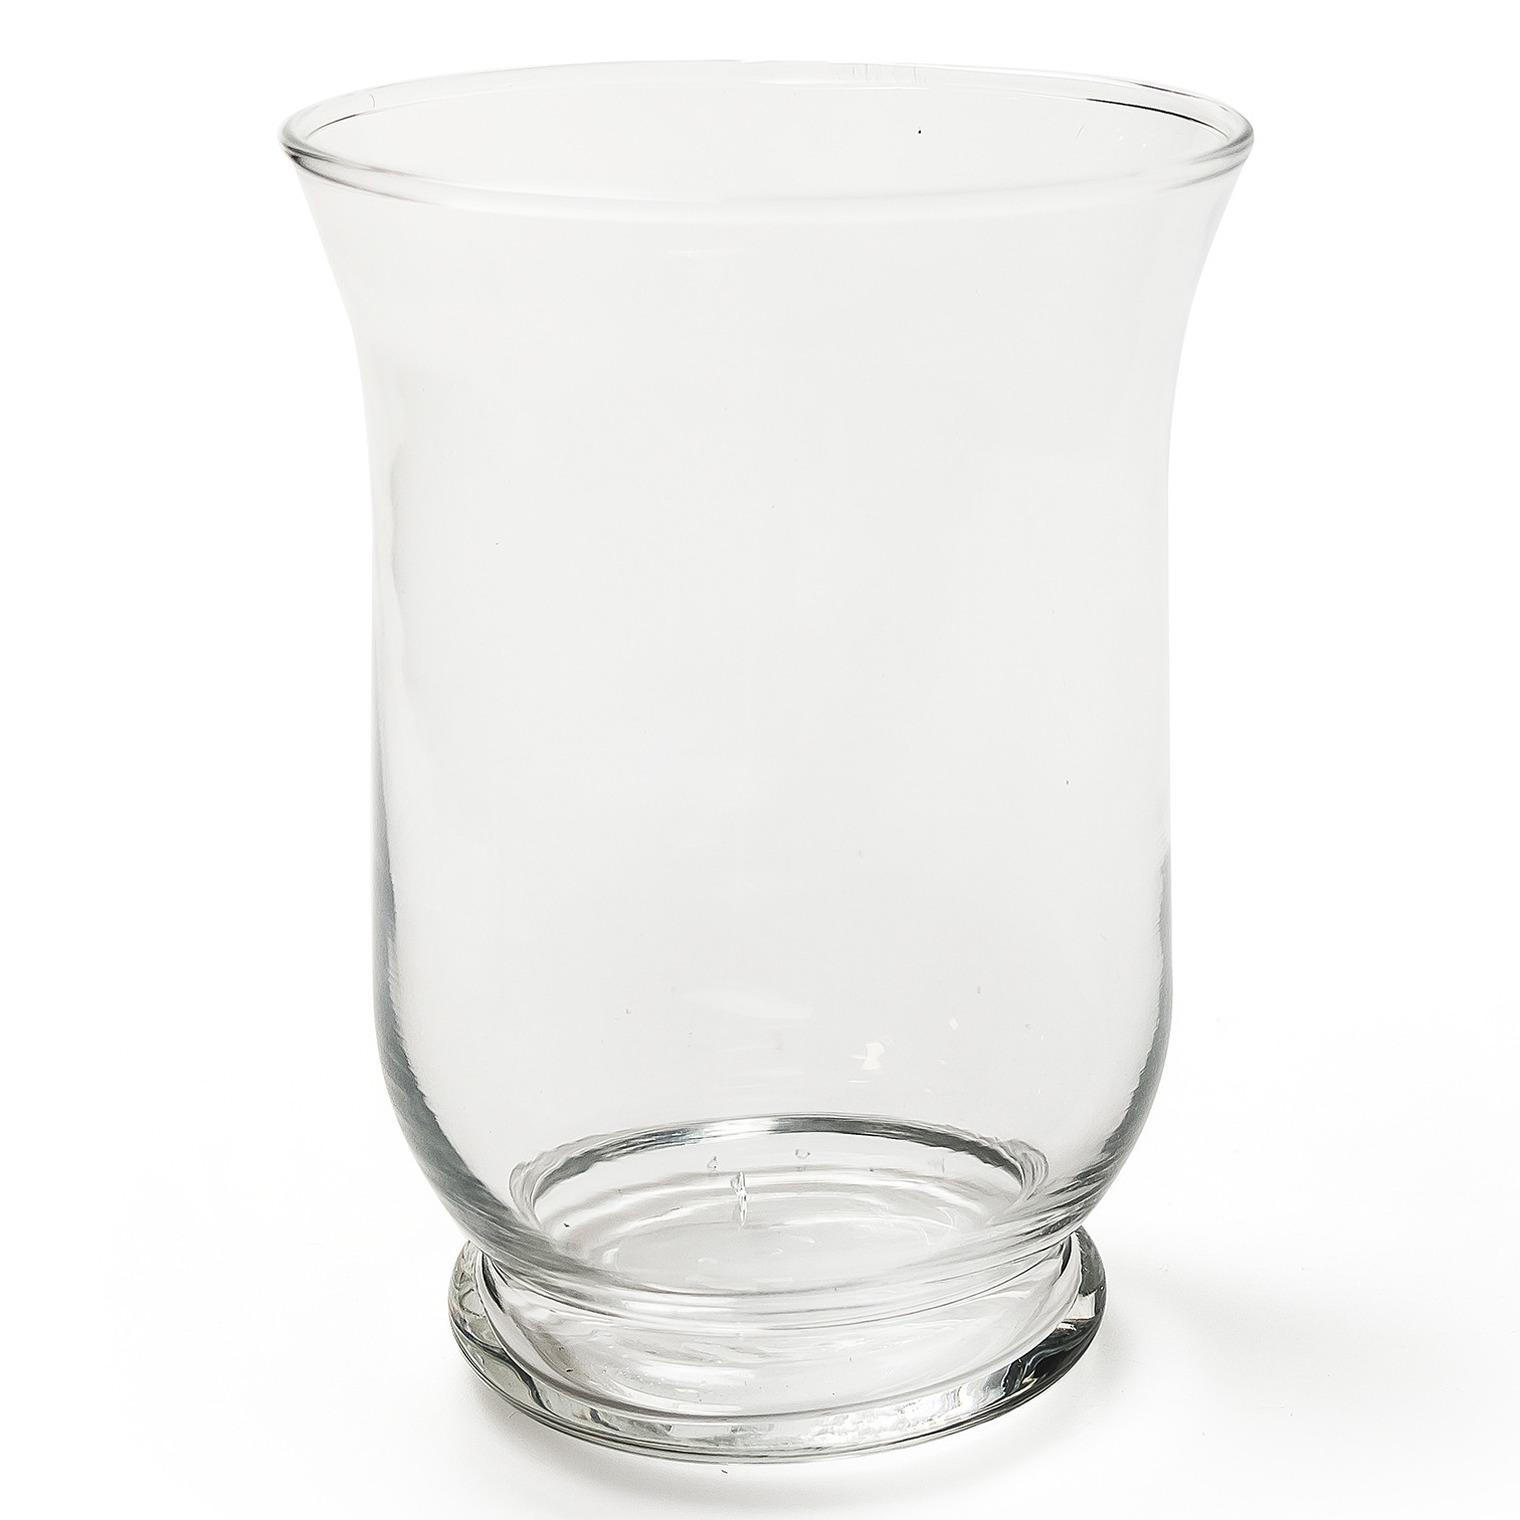 Transparante windlicht vaas-vazen van glas 11 x 15 cm